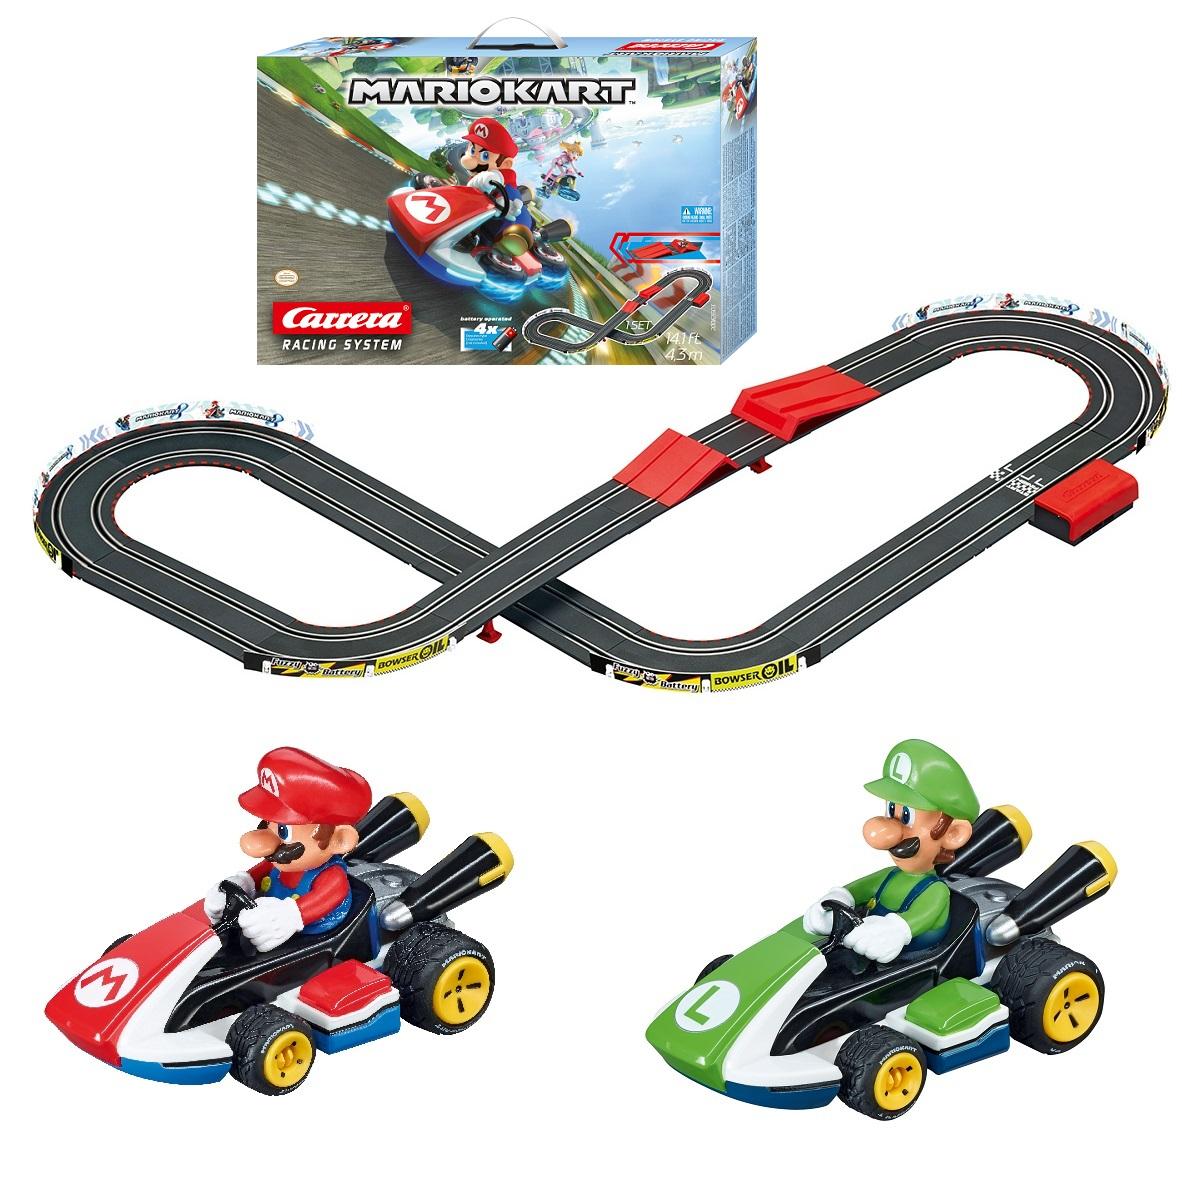 Mario Kart Slot Car Race Track Image